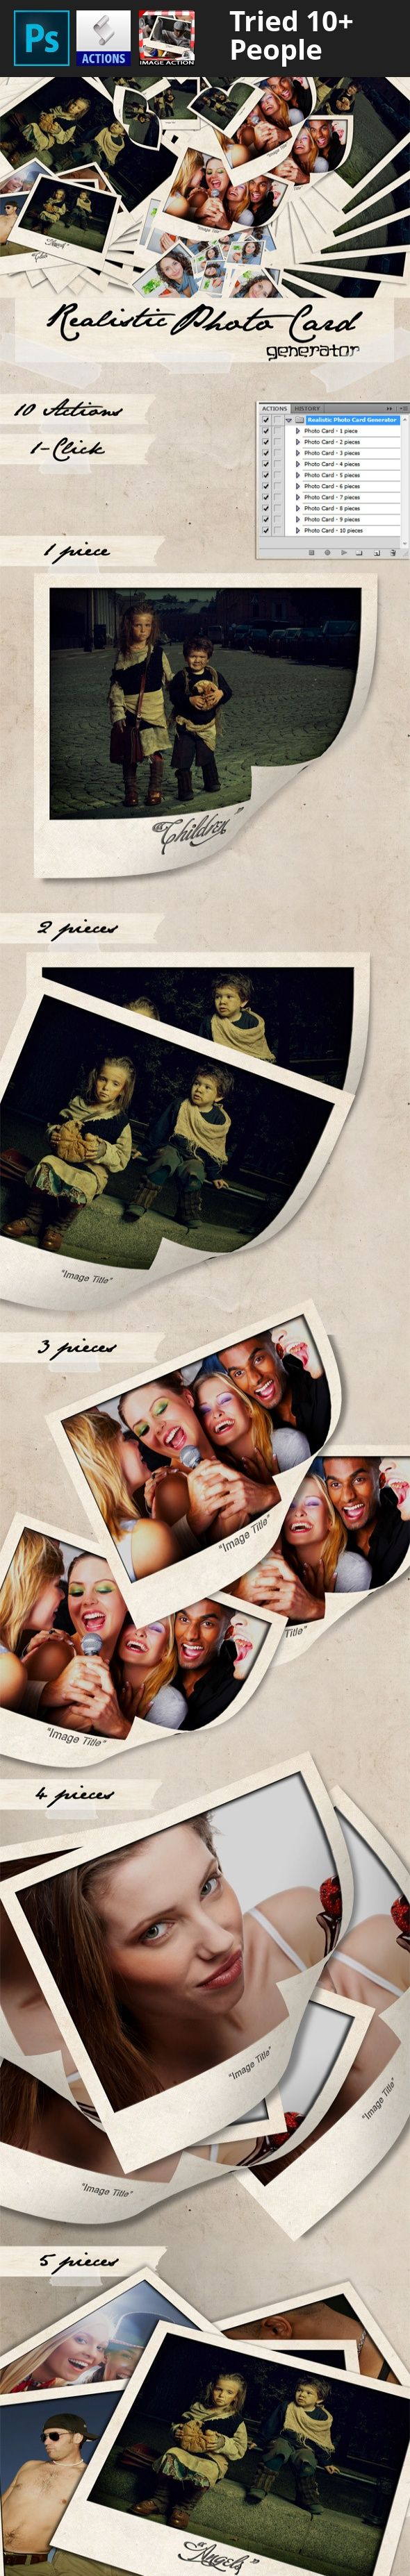 generator, Graphicriver Image Action, graphicriver polaroid, graphicriver polaroid maker, mockup, photo card, photo card generator, photoshop image action, Photoshop Image effects, photoshop polaroid, photoshop polaroid maker, polaroid, polaroid generator, polaroid mockup, realistic photo card, Realistic Photo Card Generator, realistic polaroid action, realistic polaroid effects, realistic polaroid generator, realistic polaroid maker PACKAGE DETAILS:  Package name: Realistic Photo Card…